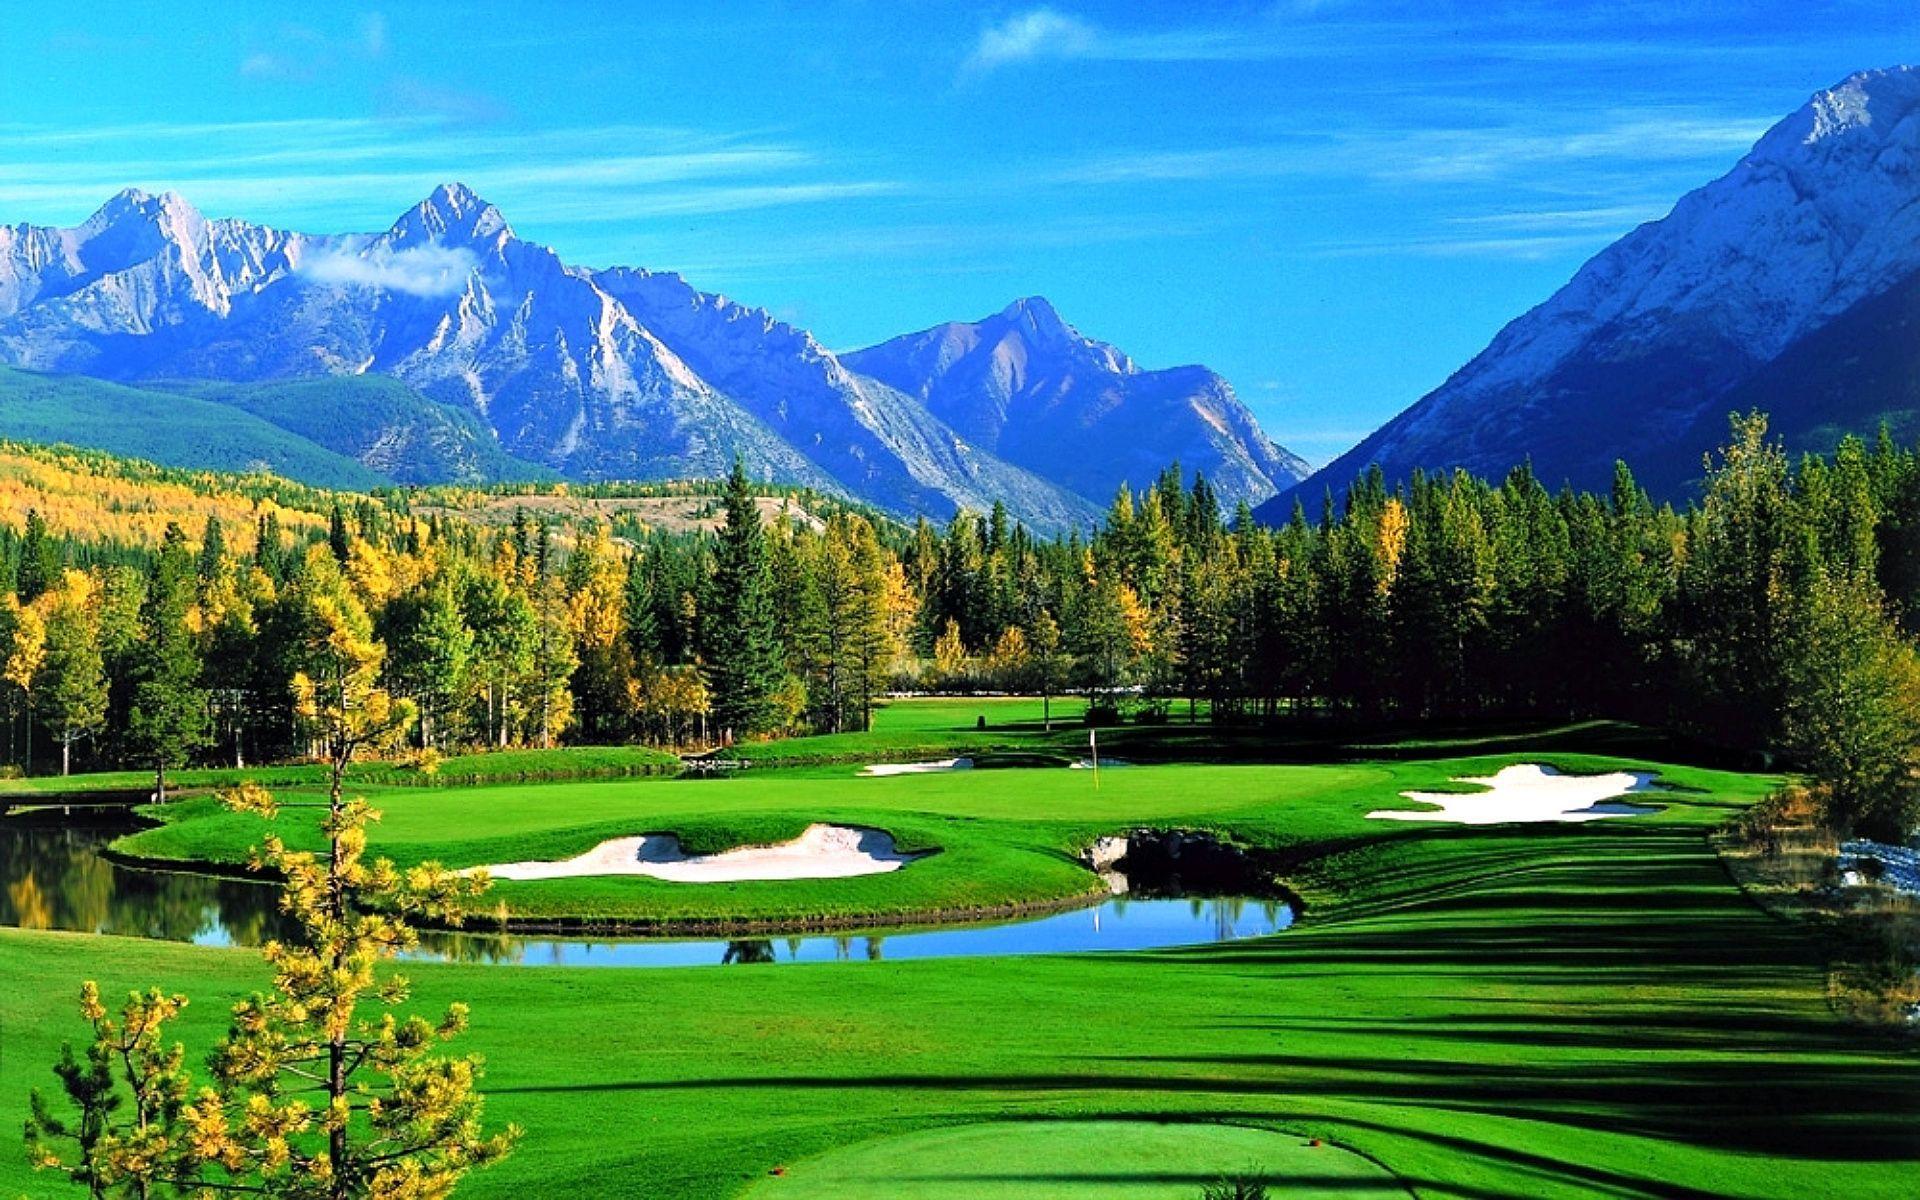 Golf Course Desktop Wallpapers Top Free Golf Course Desktop Backgrounds Wallpaperaccess